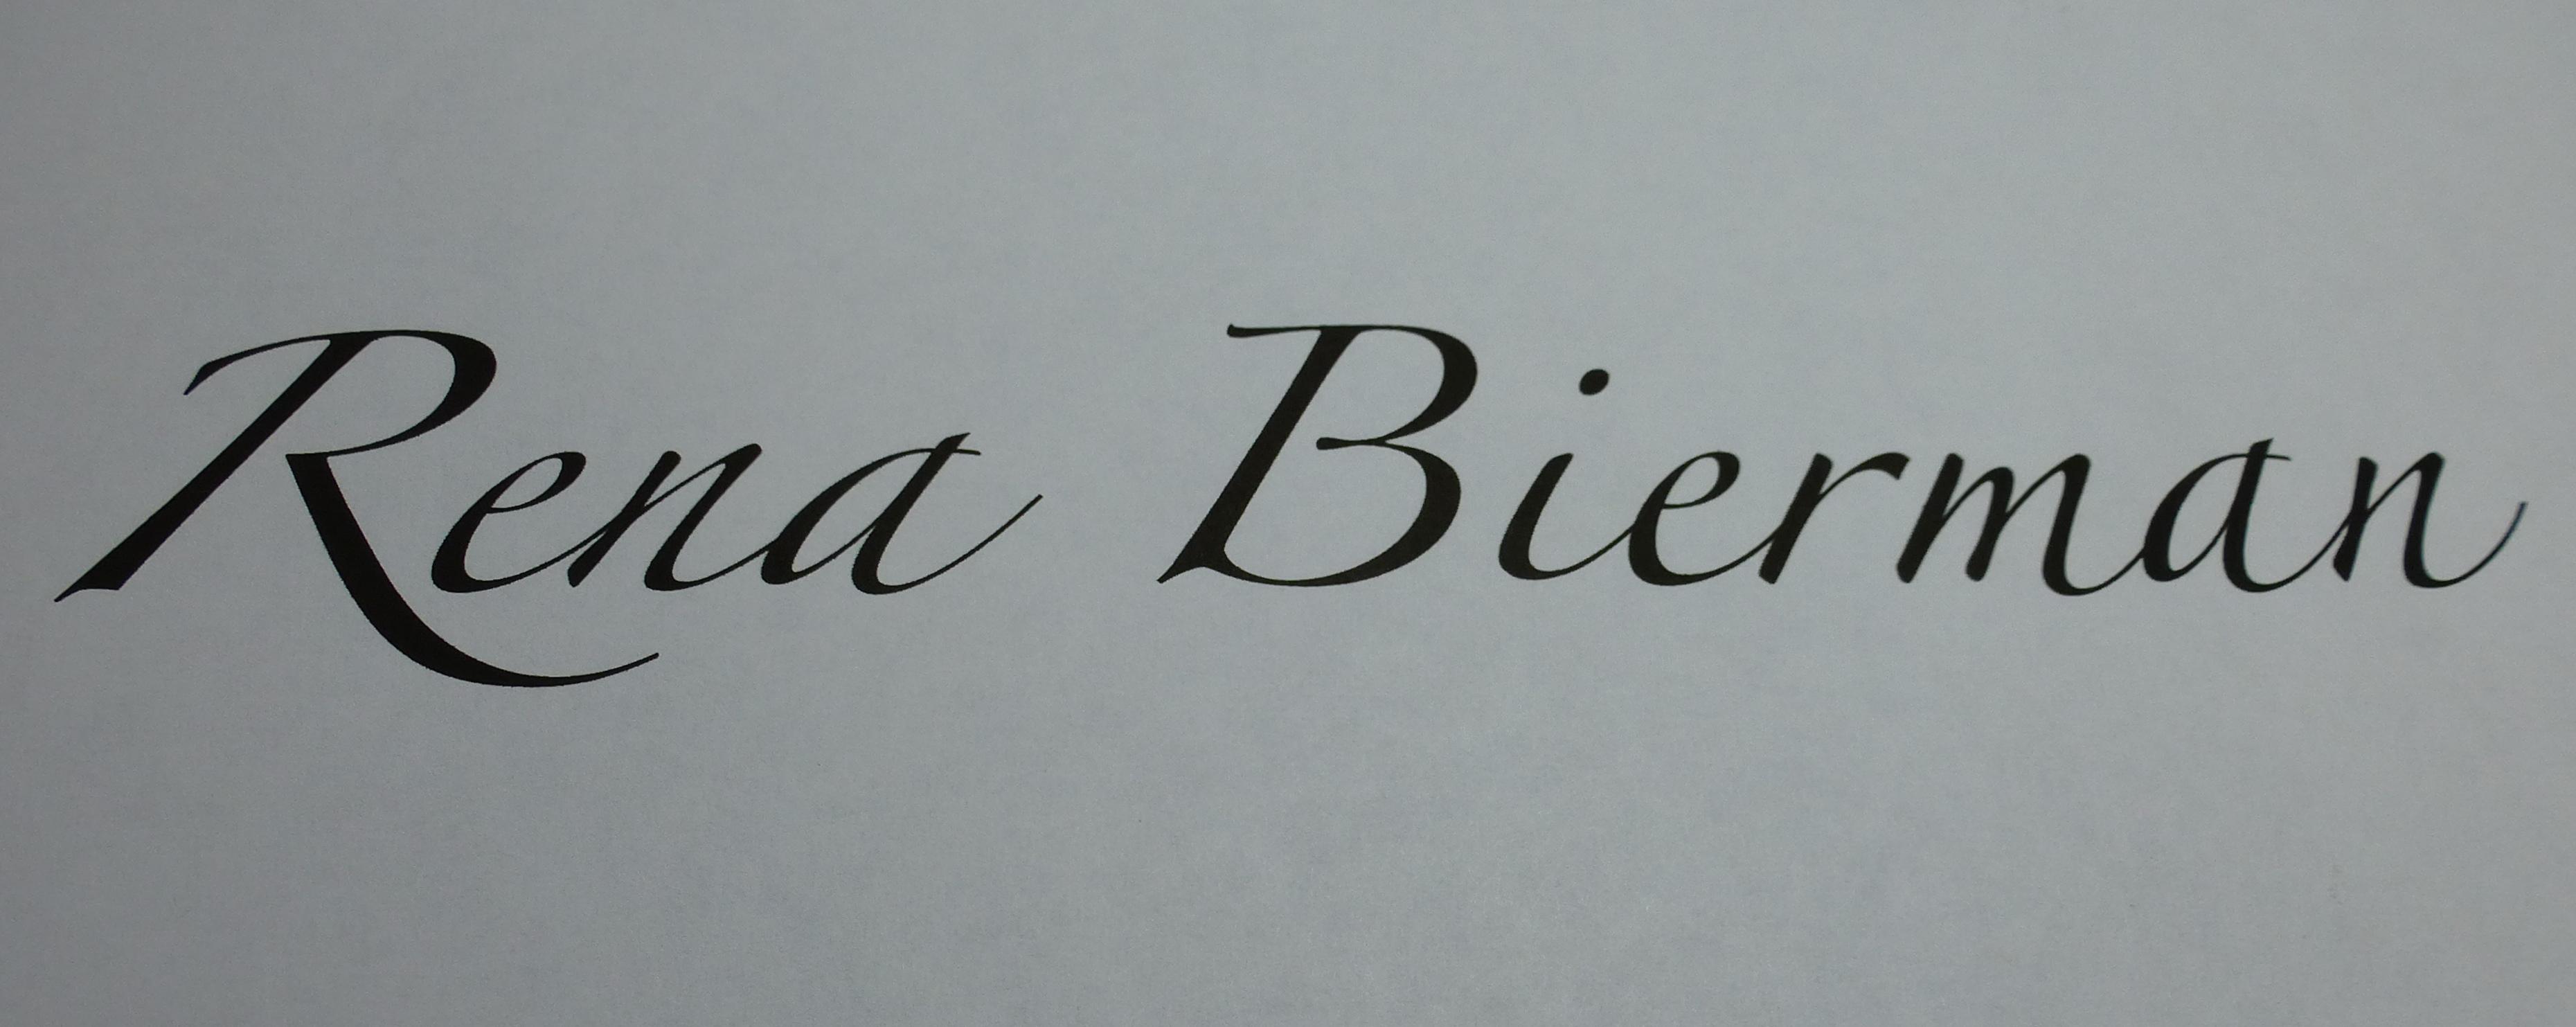 Rena Bierman's Signature